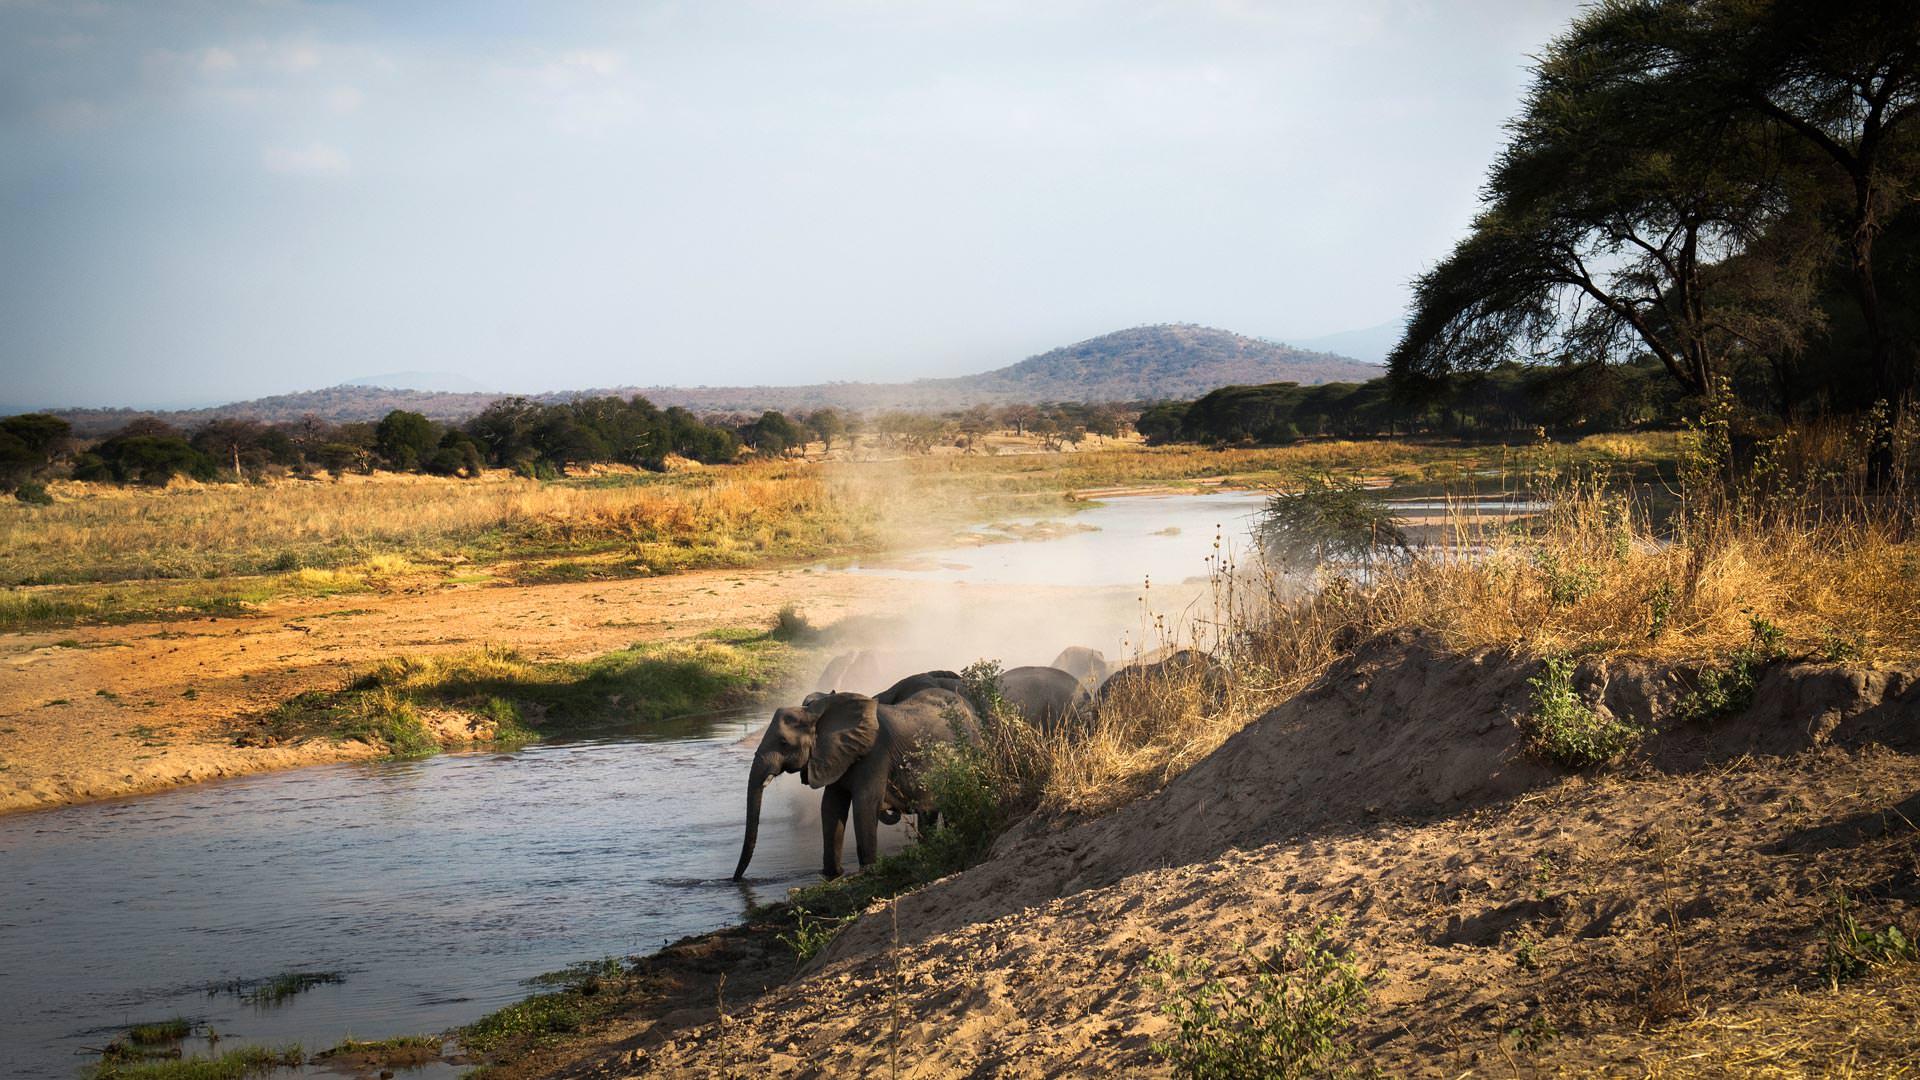 Elephants drinking in the Ruaha River